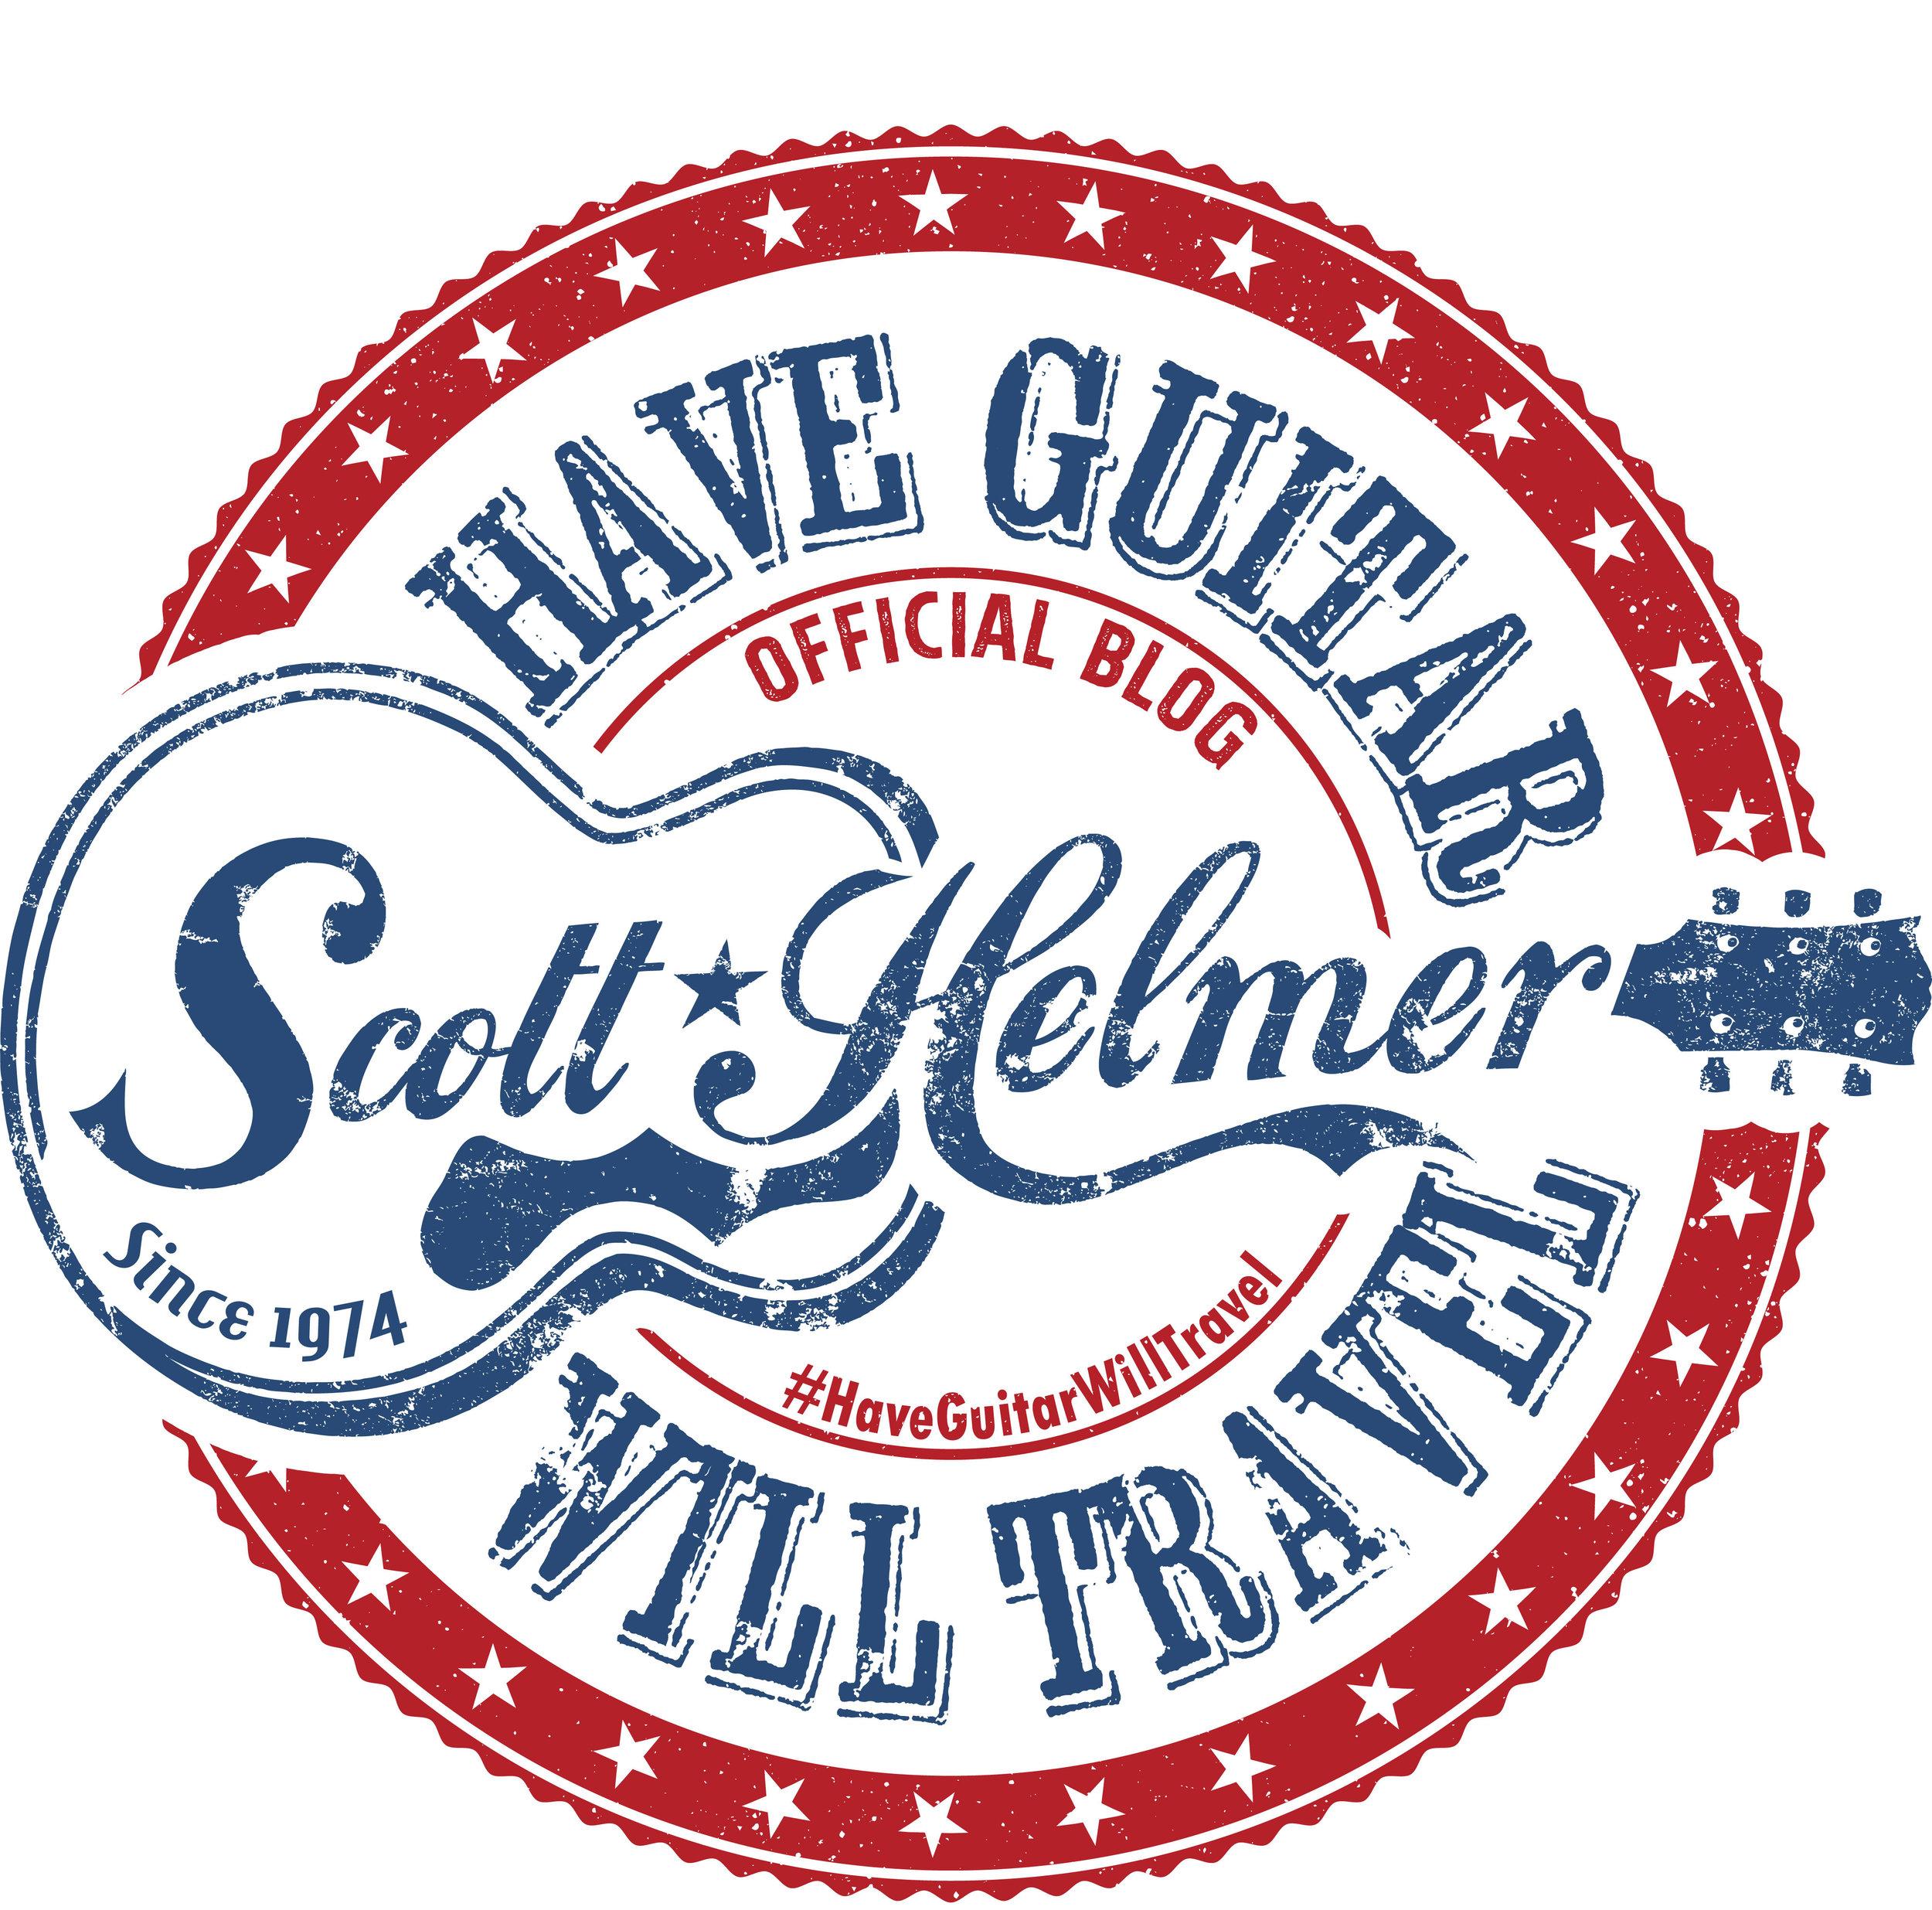 Scott Helmer • Have Guitar Will Travel